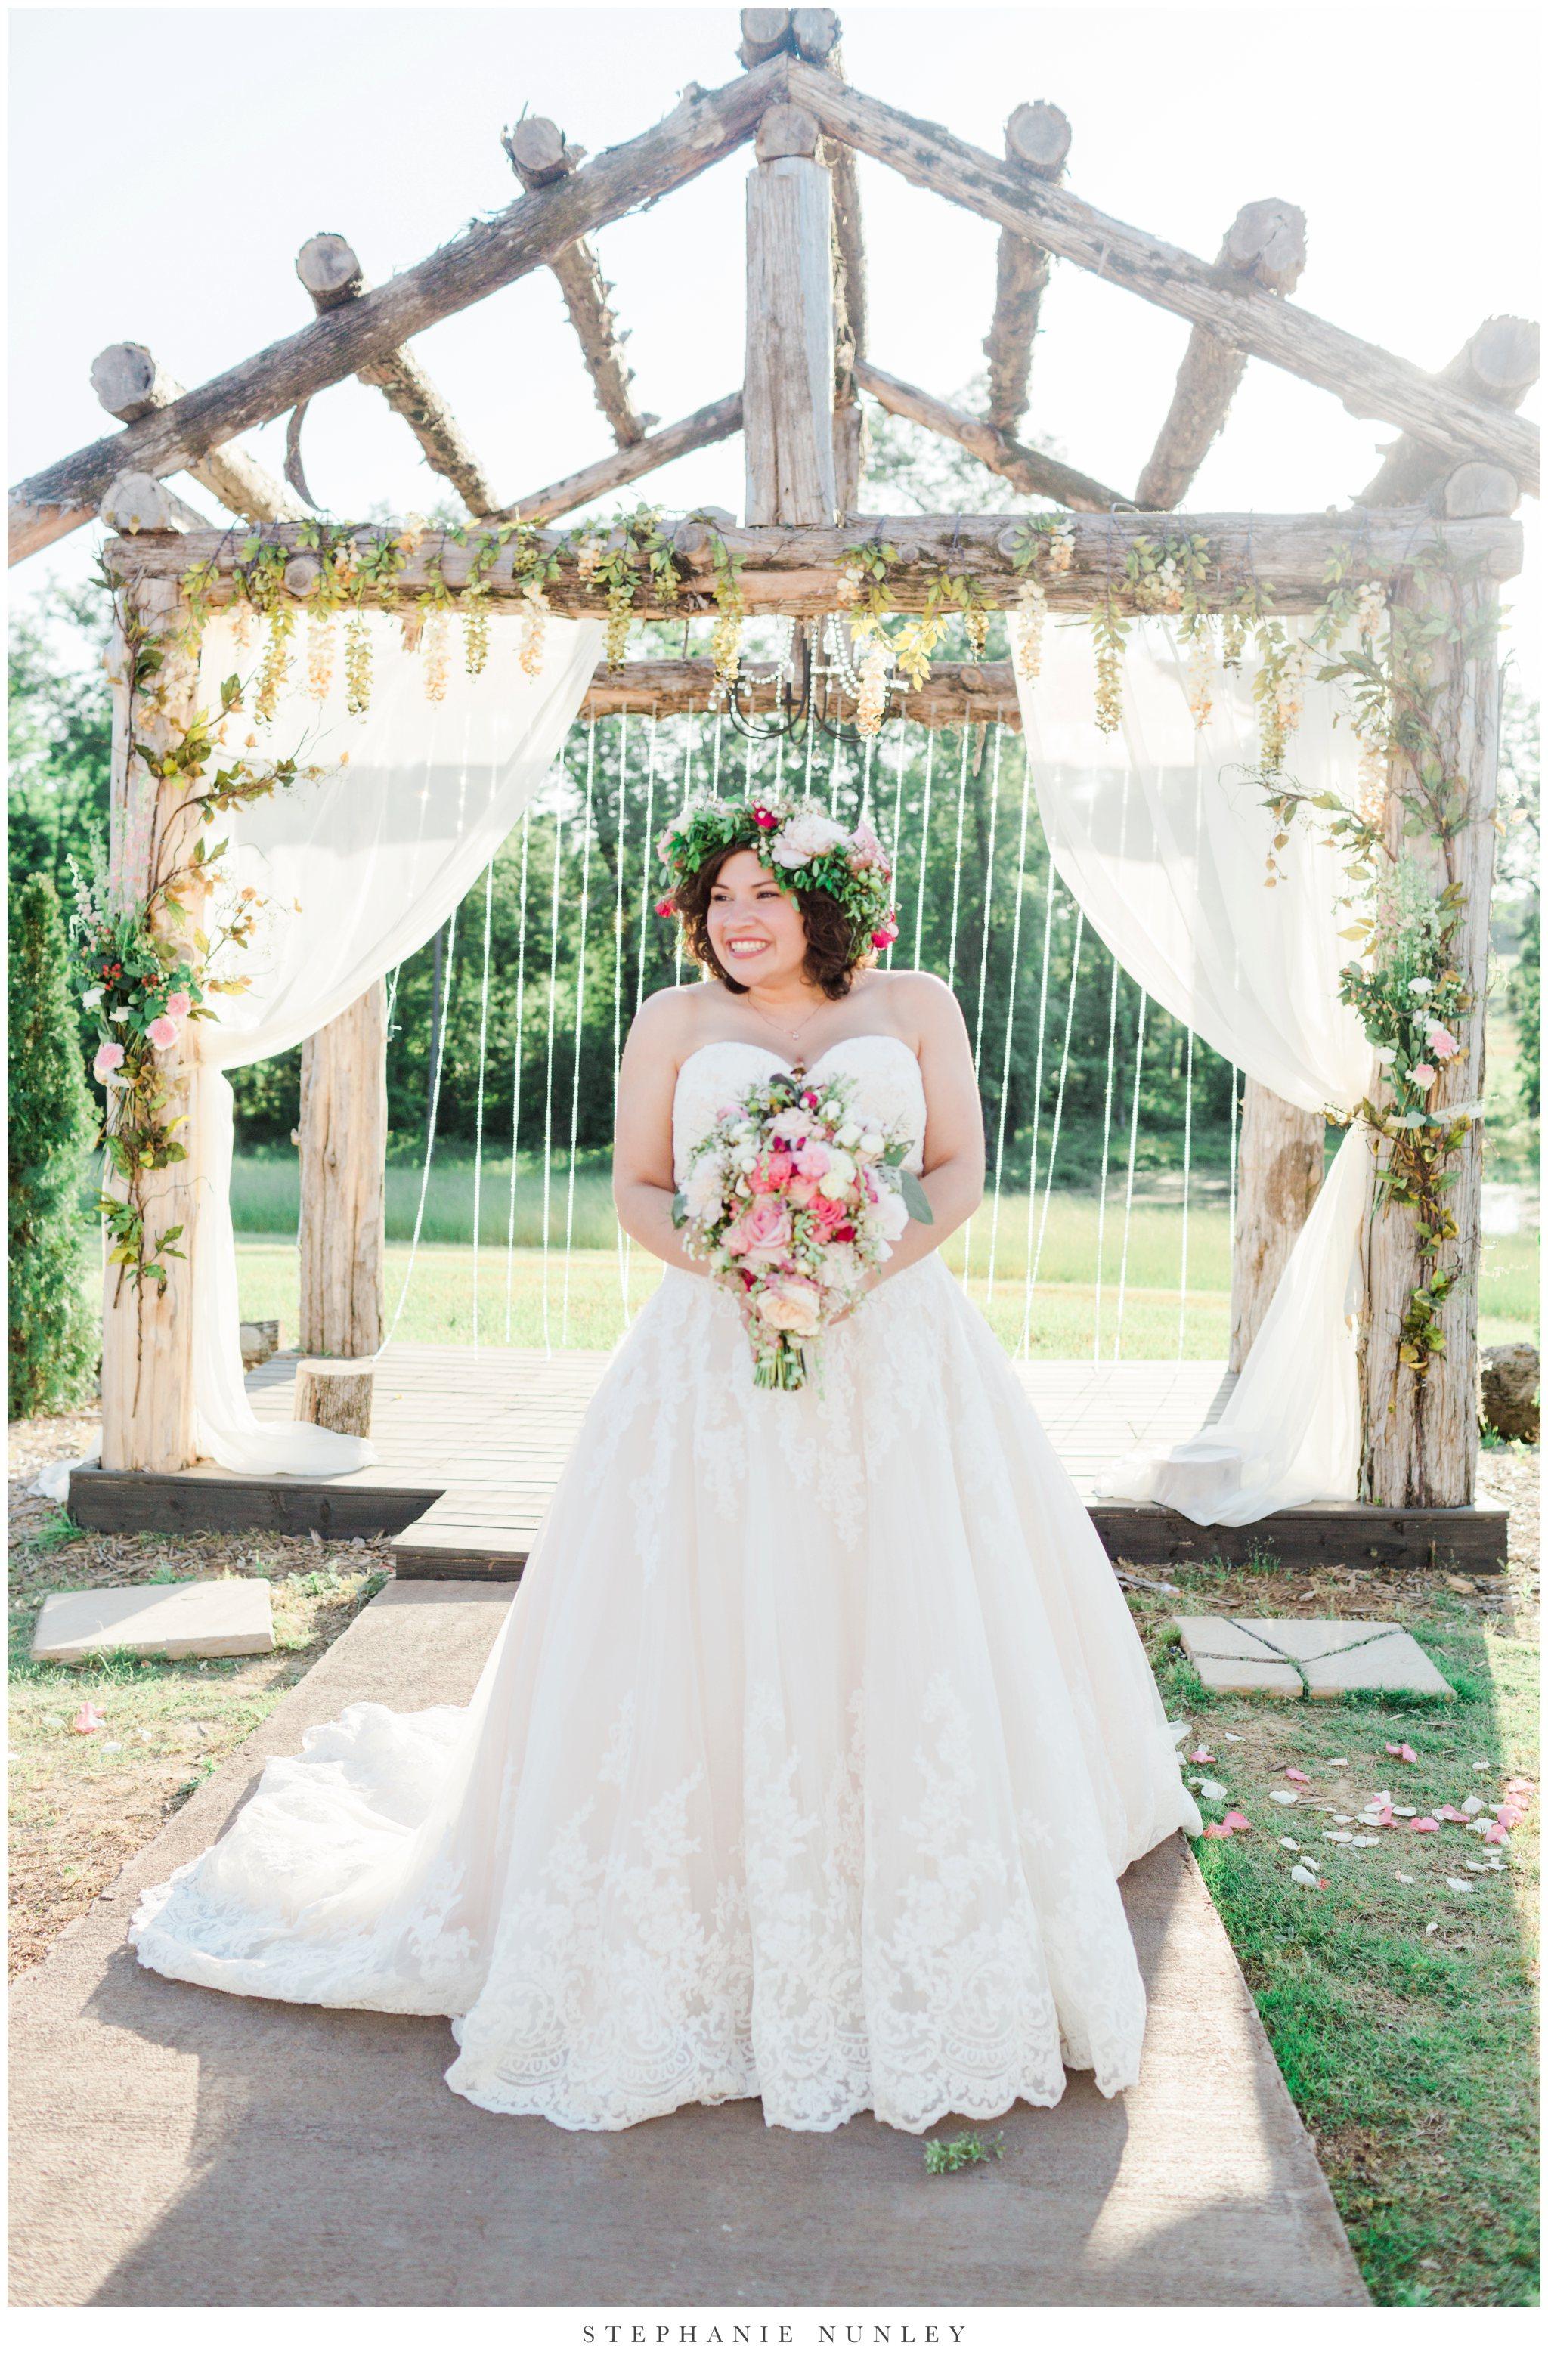 romantic-outdoor-wedding-with-flower-crown-0105.jpg